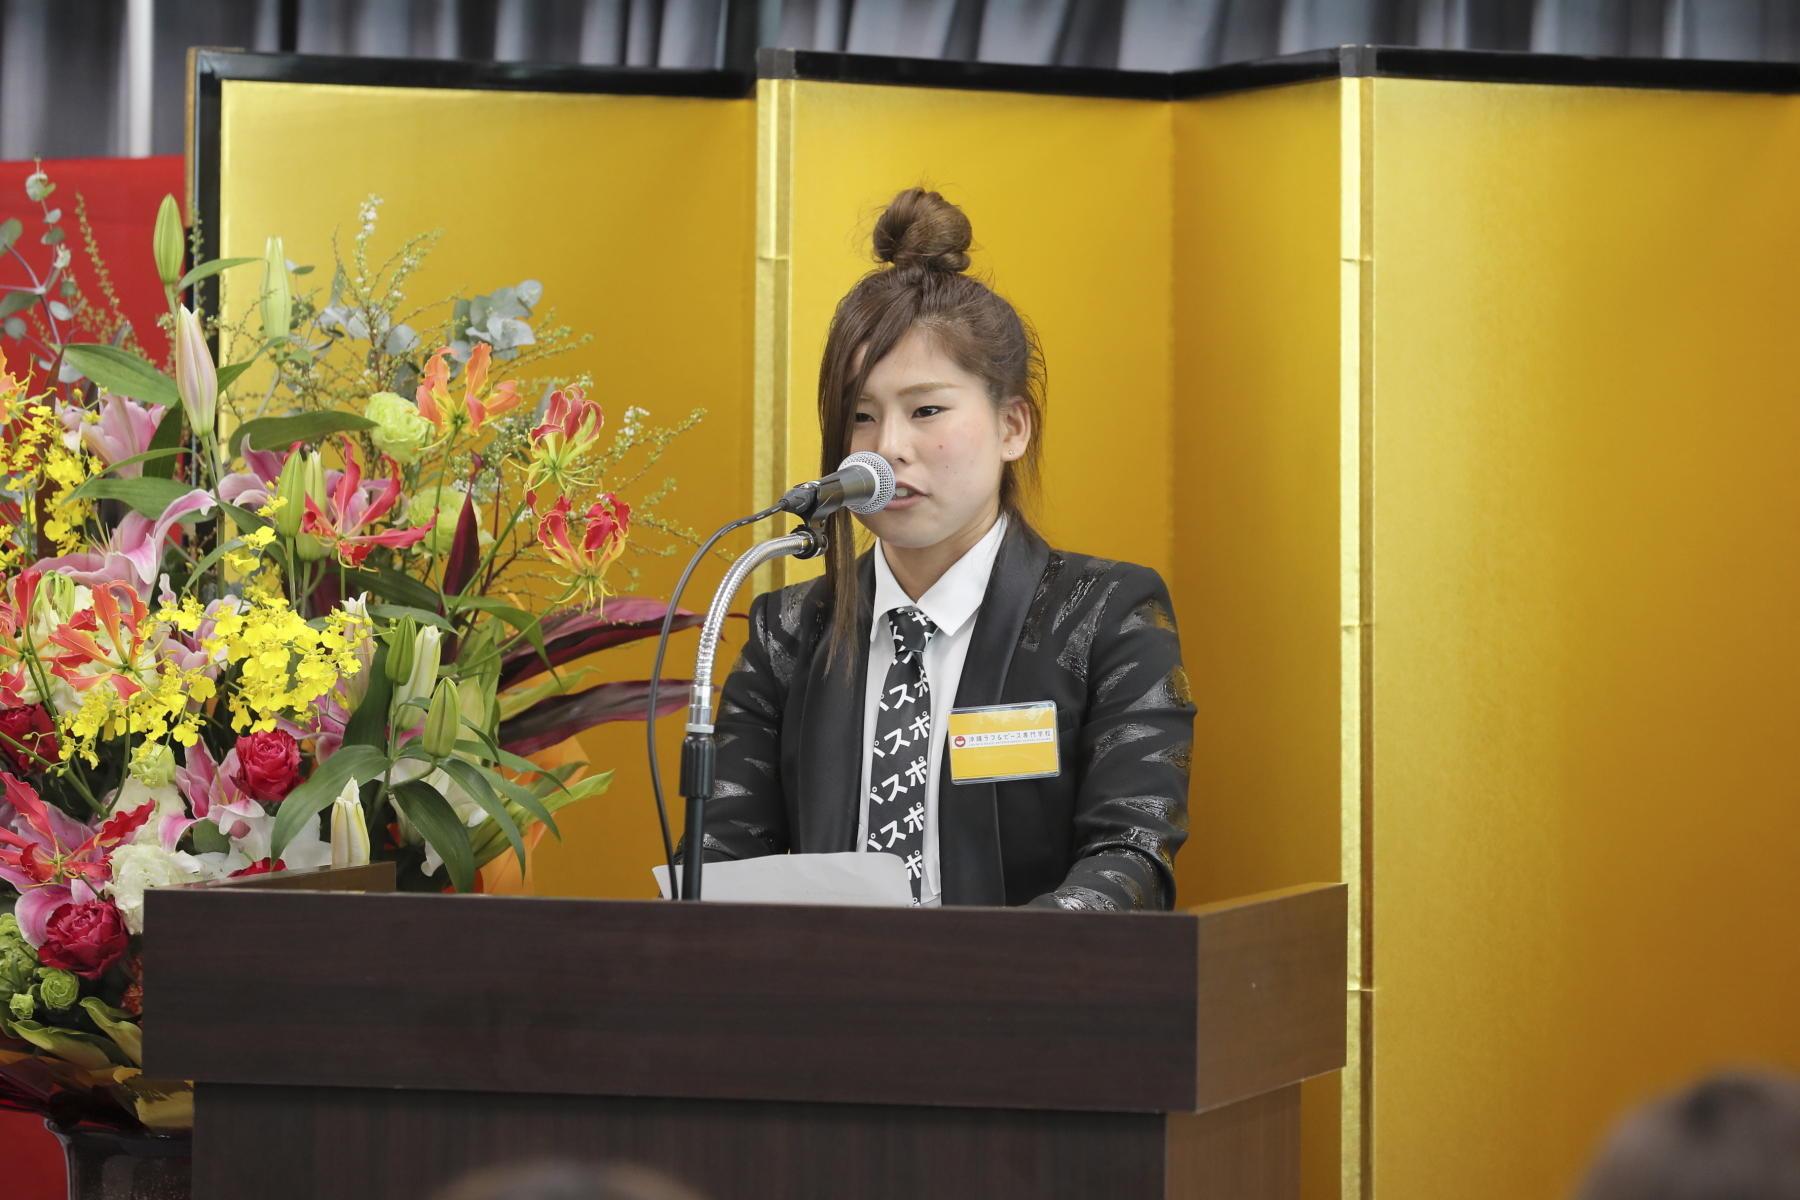 http://news.yoshimoto.co.jp/20180409185531-52e2f5d9cc1eadded9de83f07ebf95b909d42b64.jpg